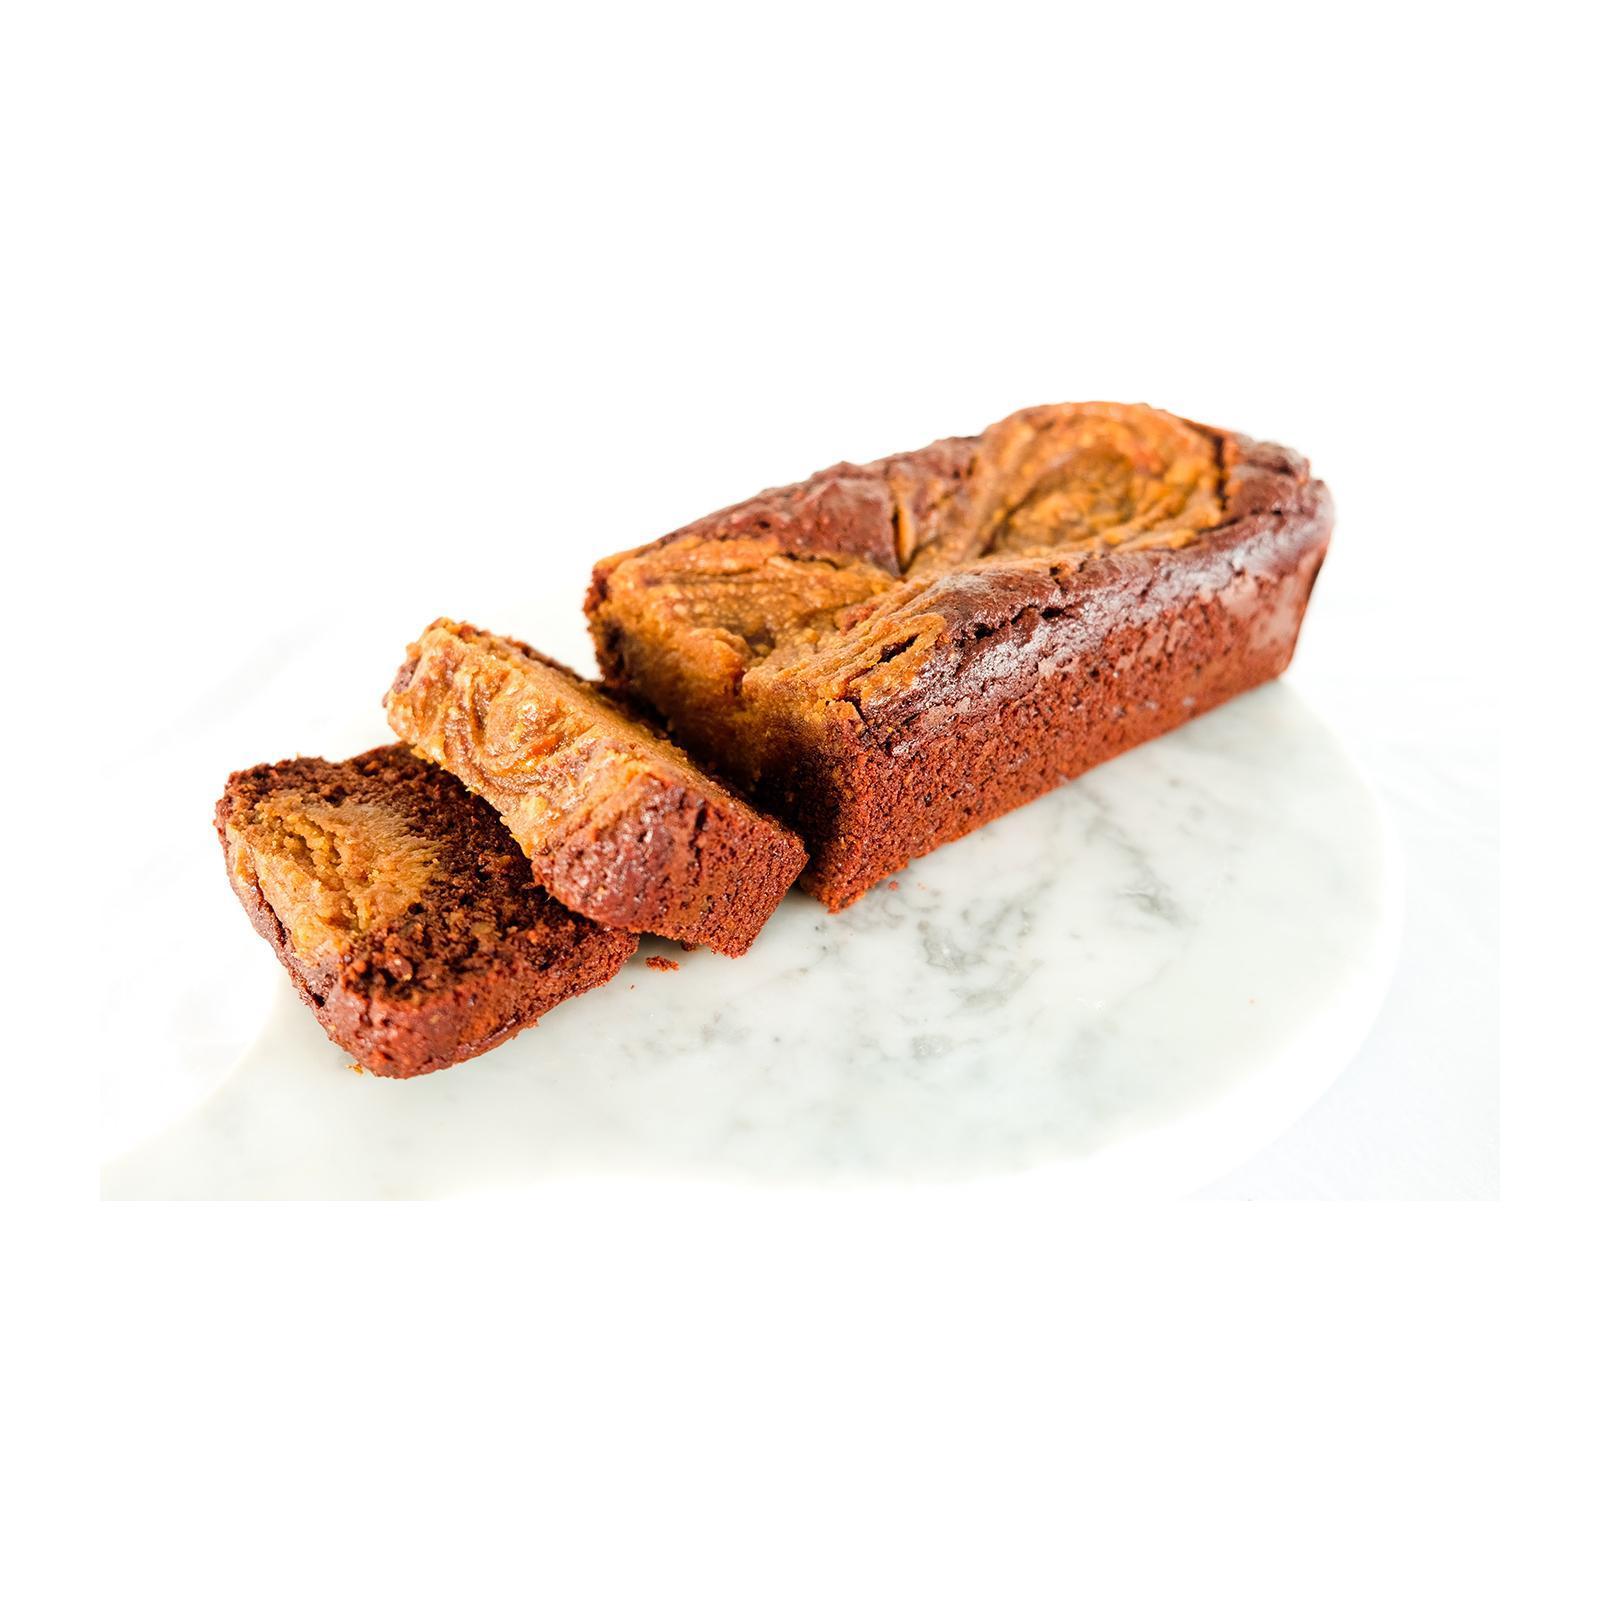 The Whole Kitchen Gluten Free Chocolate Peanut Butter Cake - Frozen